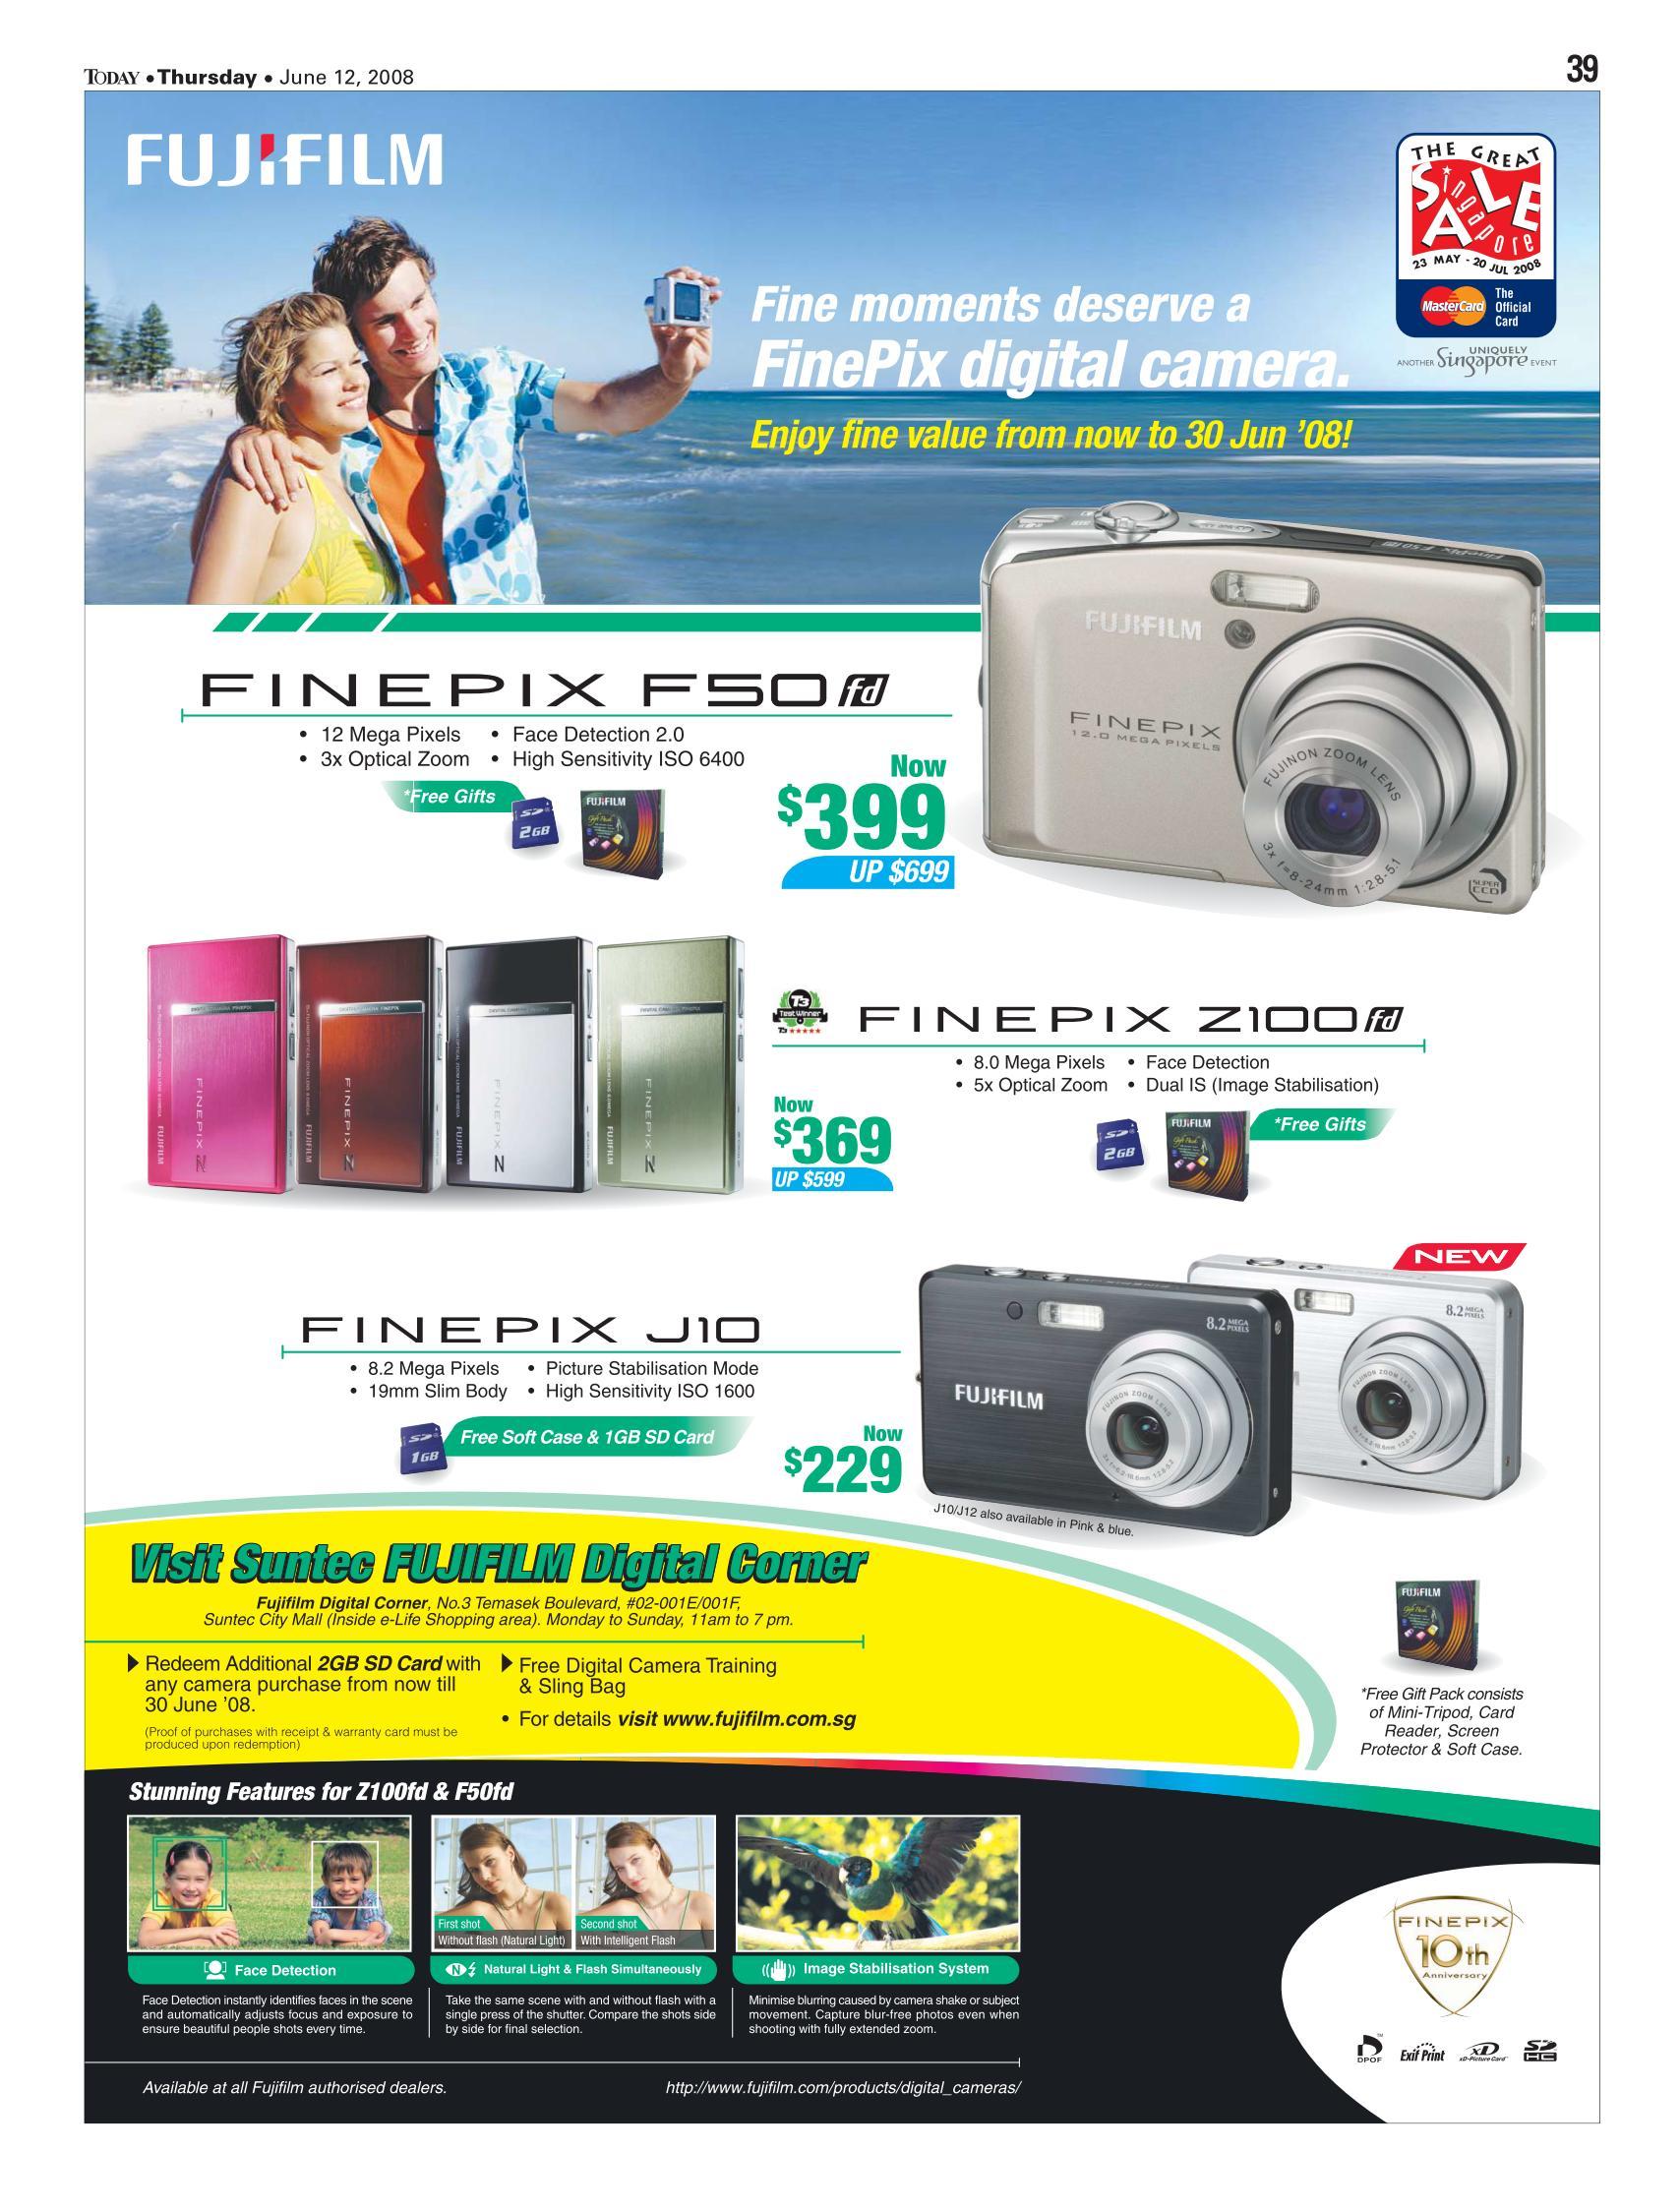 PC Show 2008 price list image brochure of Fujifilm Finepix Cameras